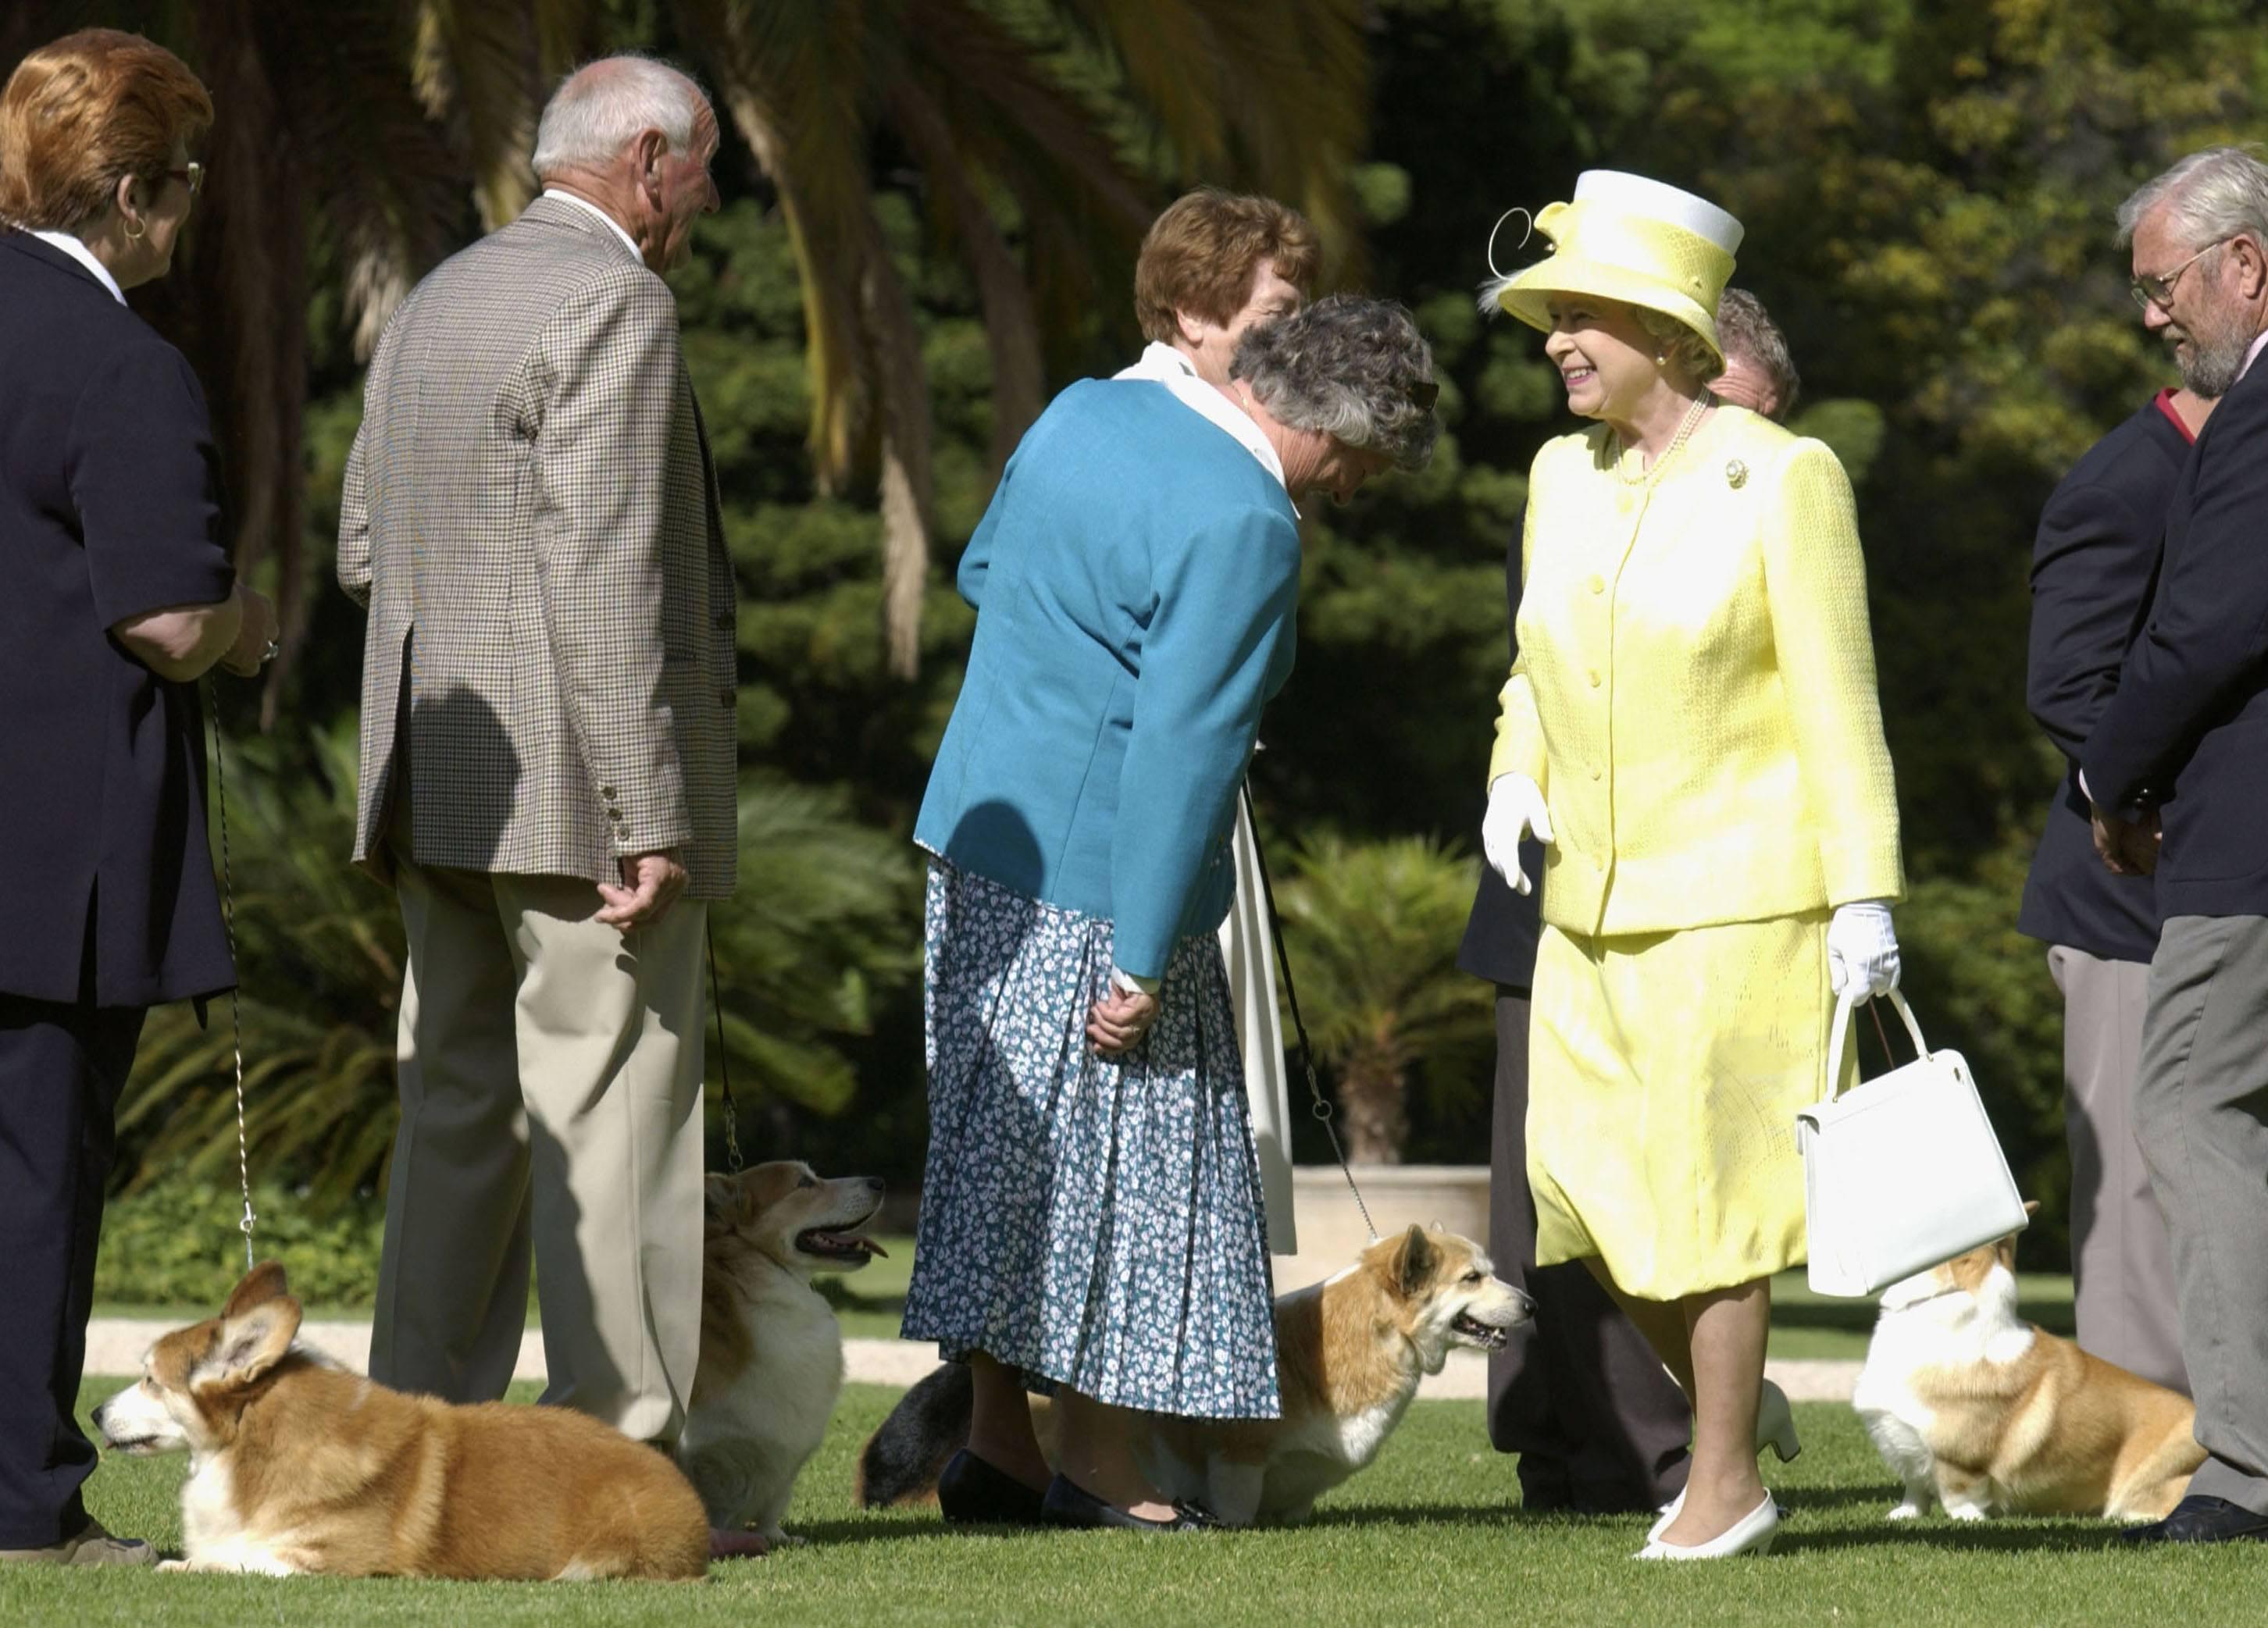 Queen Elizabeth in Australia with corgis